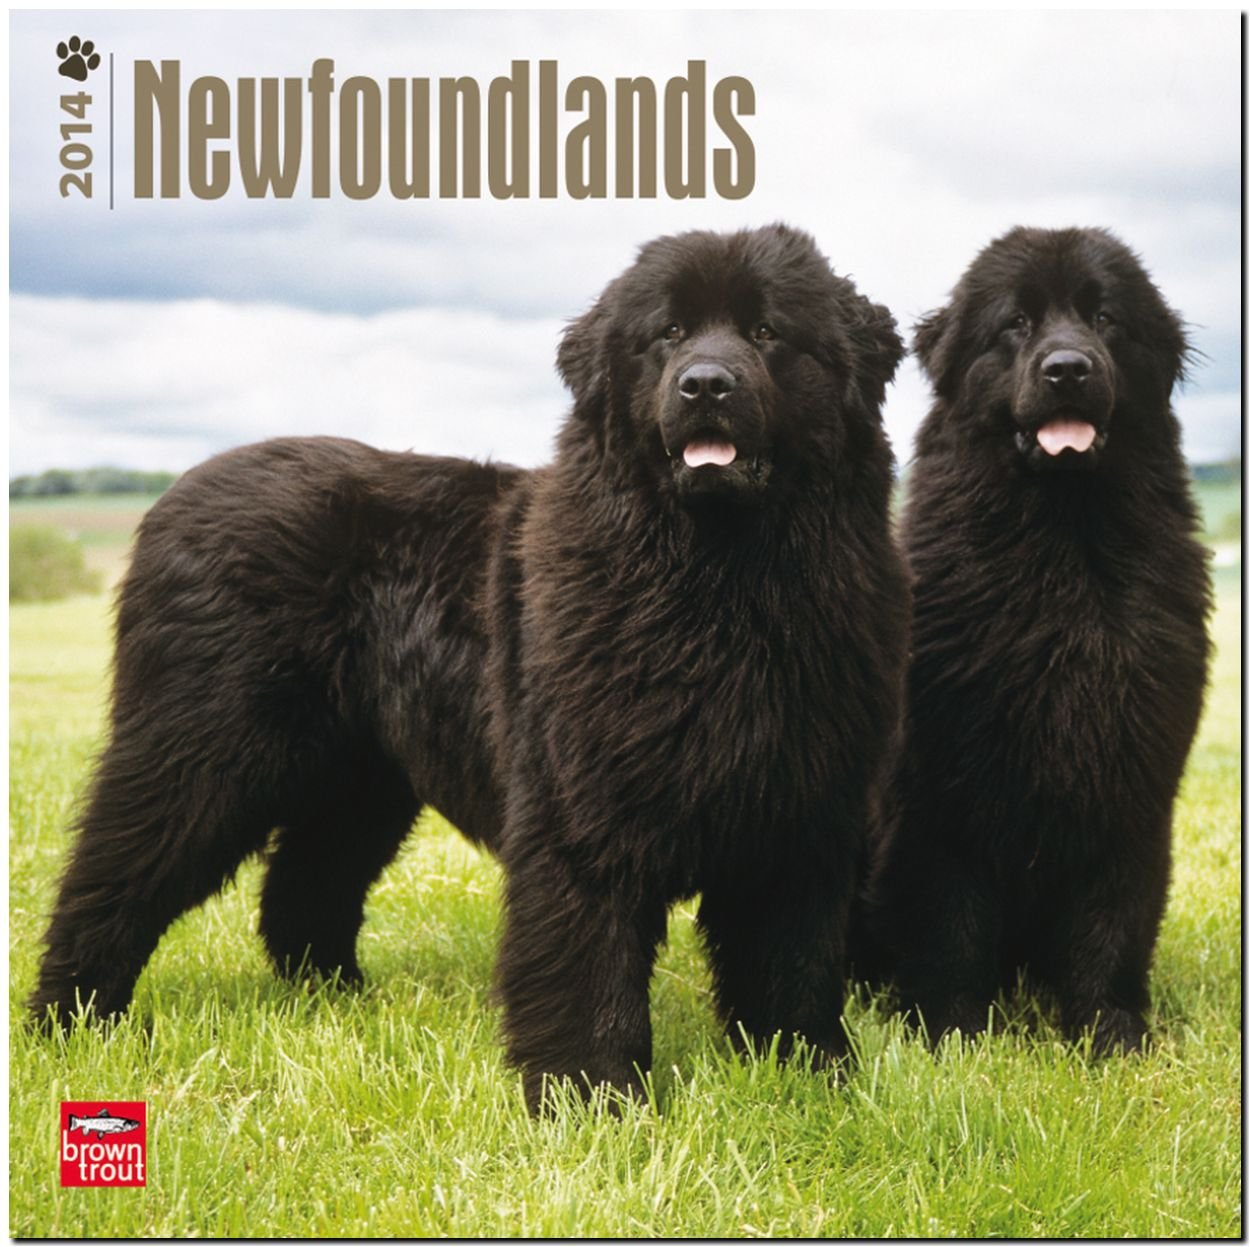 Newfoundlands 2014 - Neufundländer: Original BrownTrout-Kalender [Mehrsprachig] [Kalender]